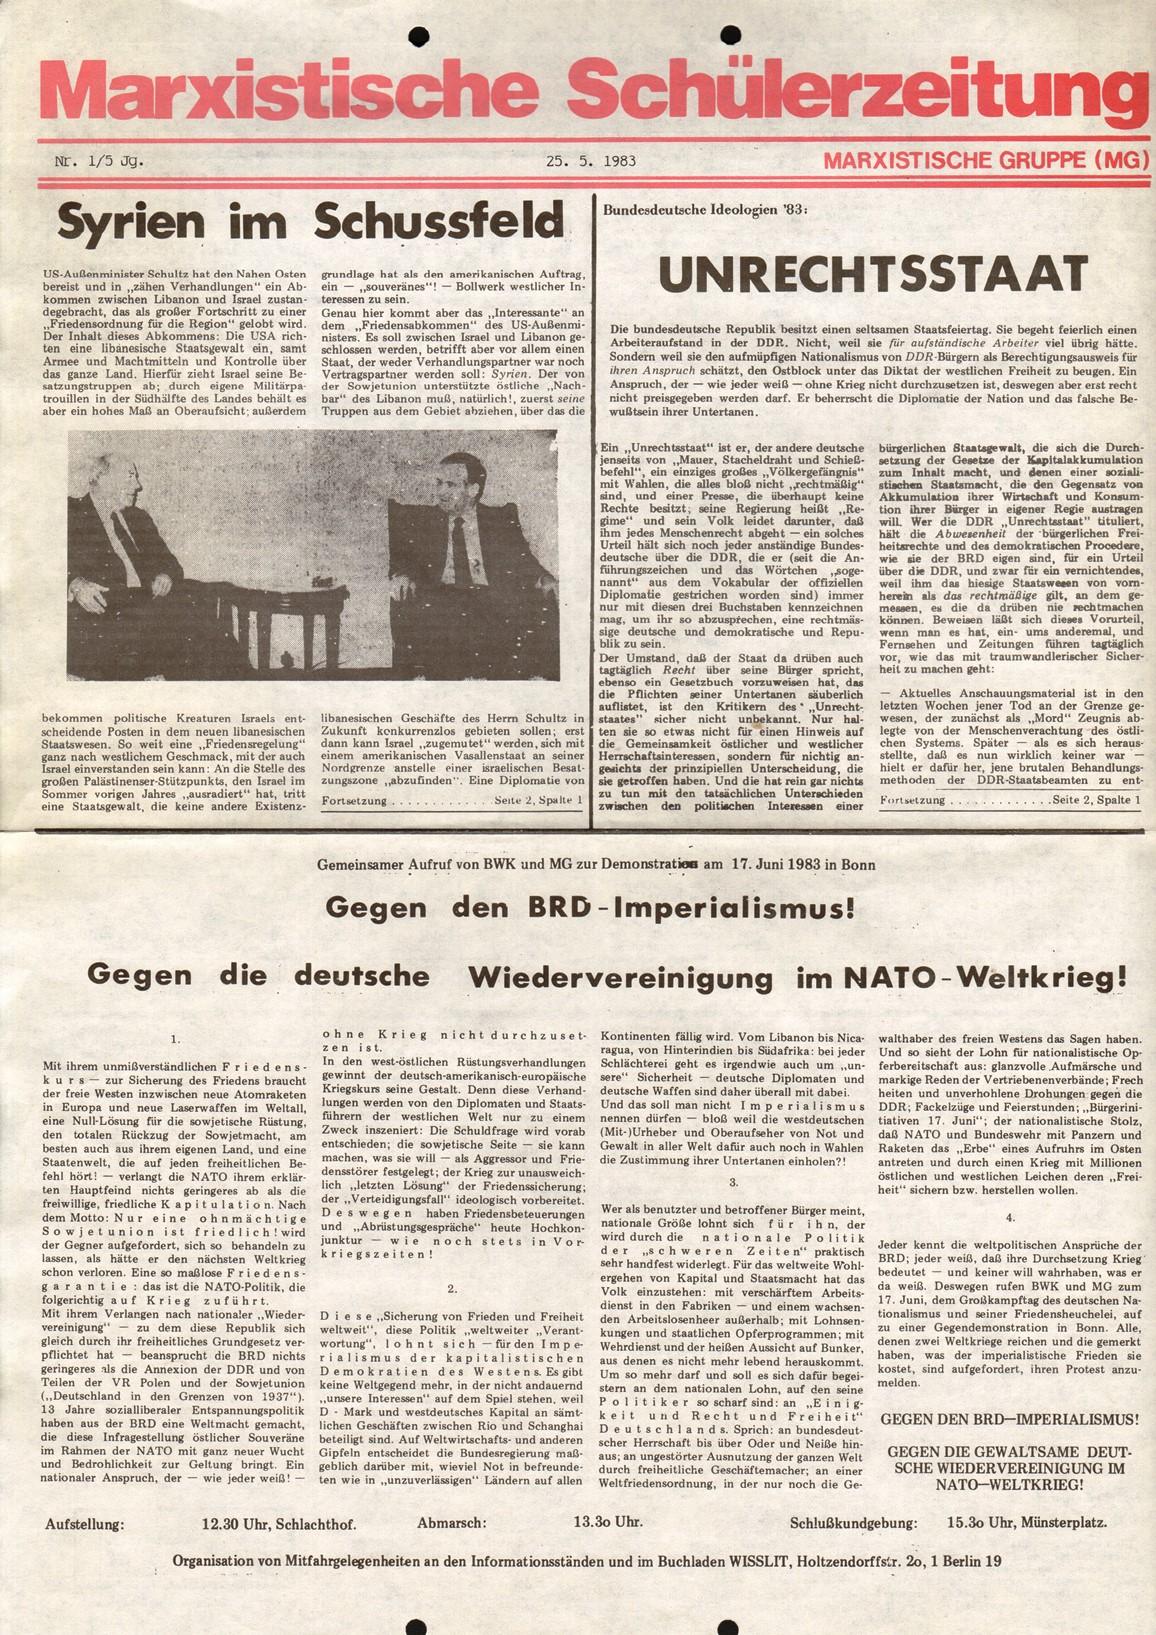 Berlin_MG_Marxistische_Schuelerzeitung_19830525_01